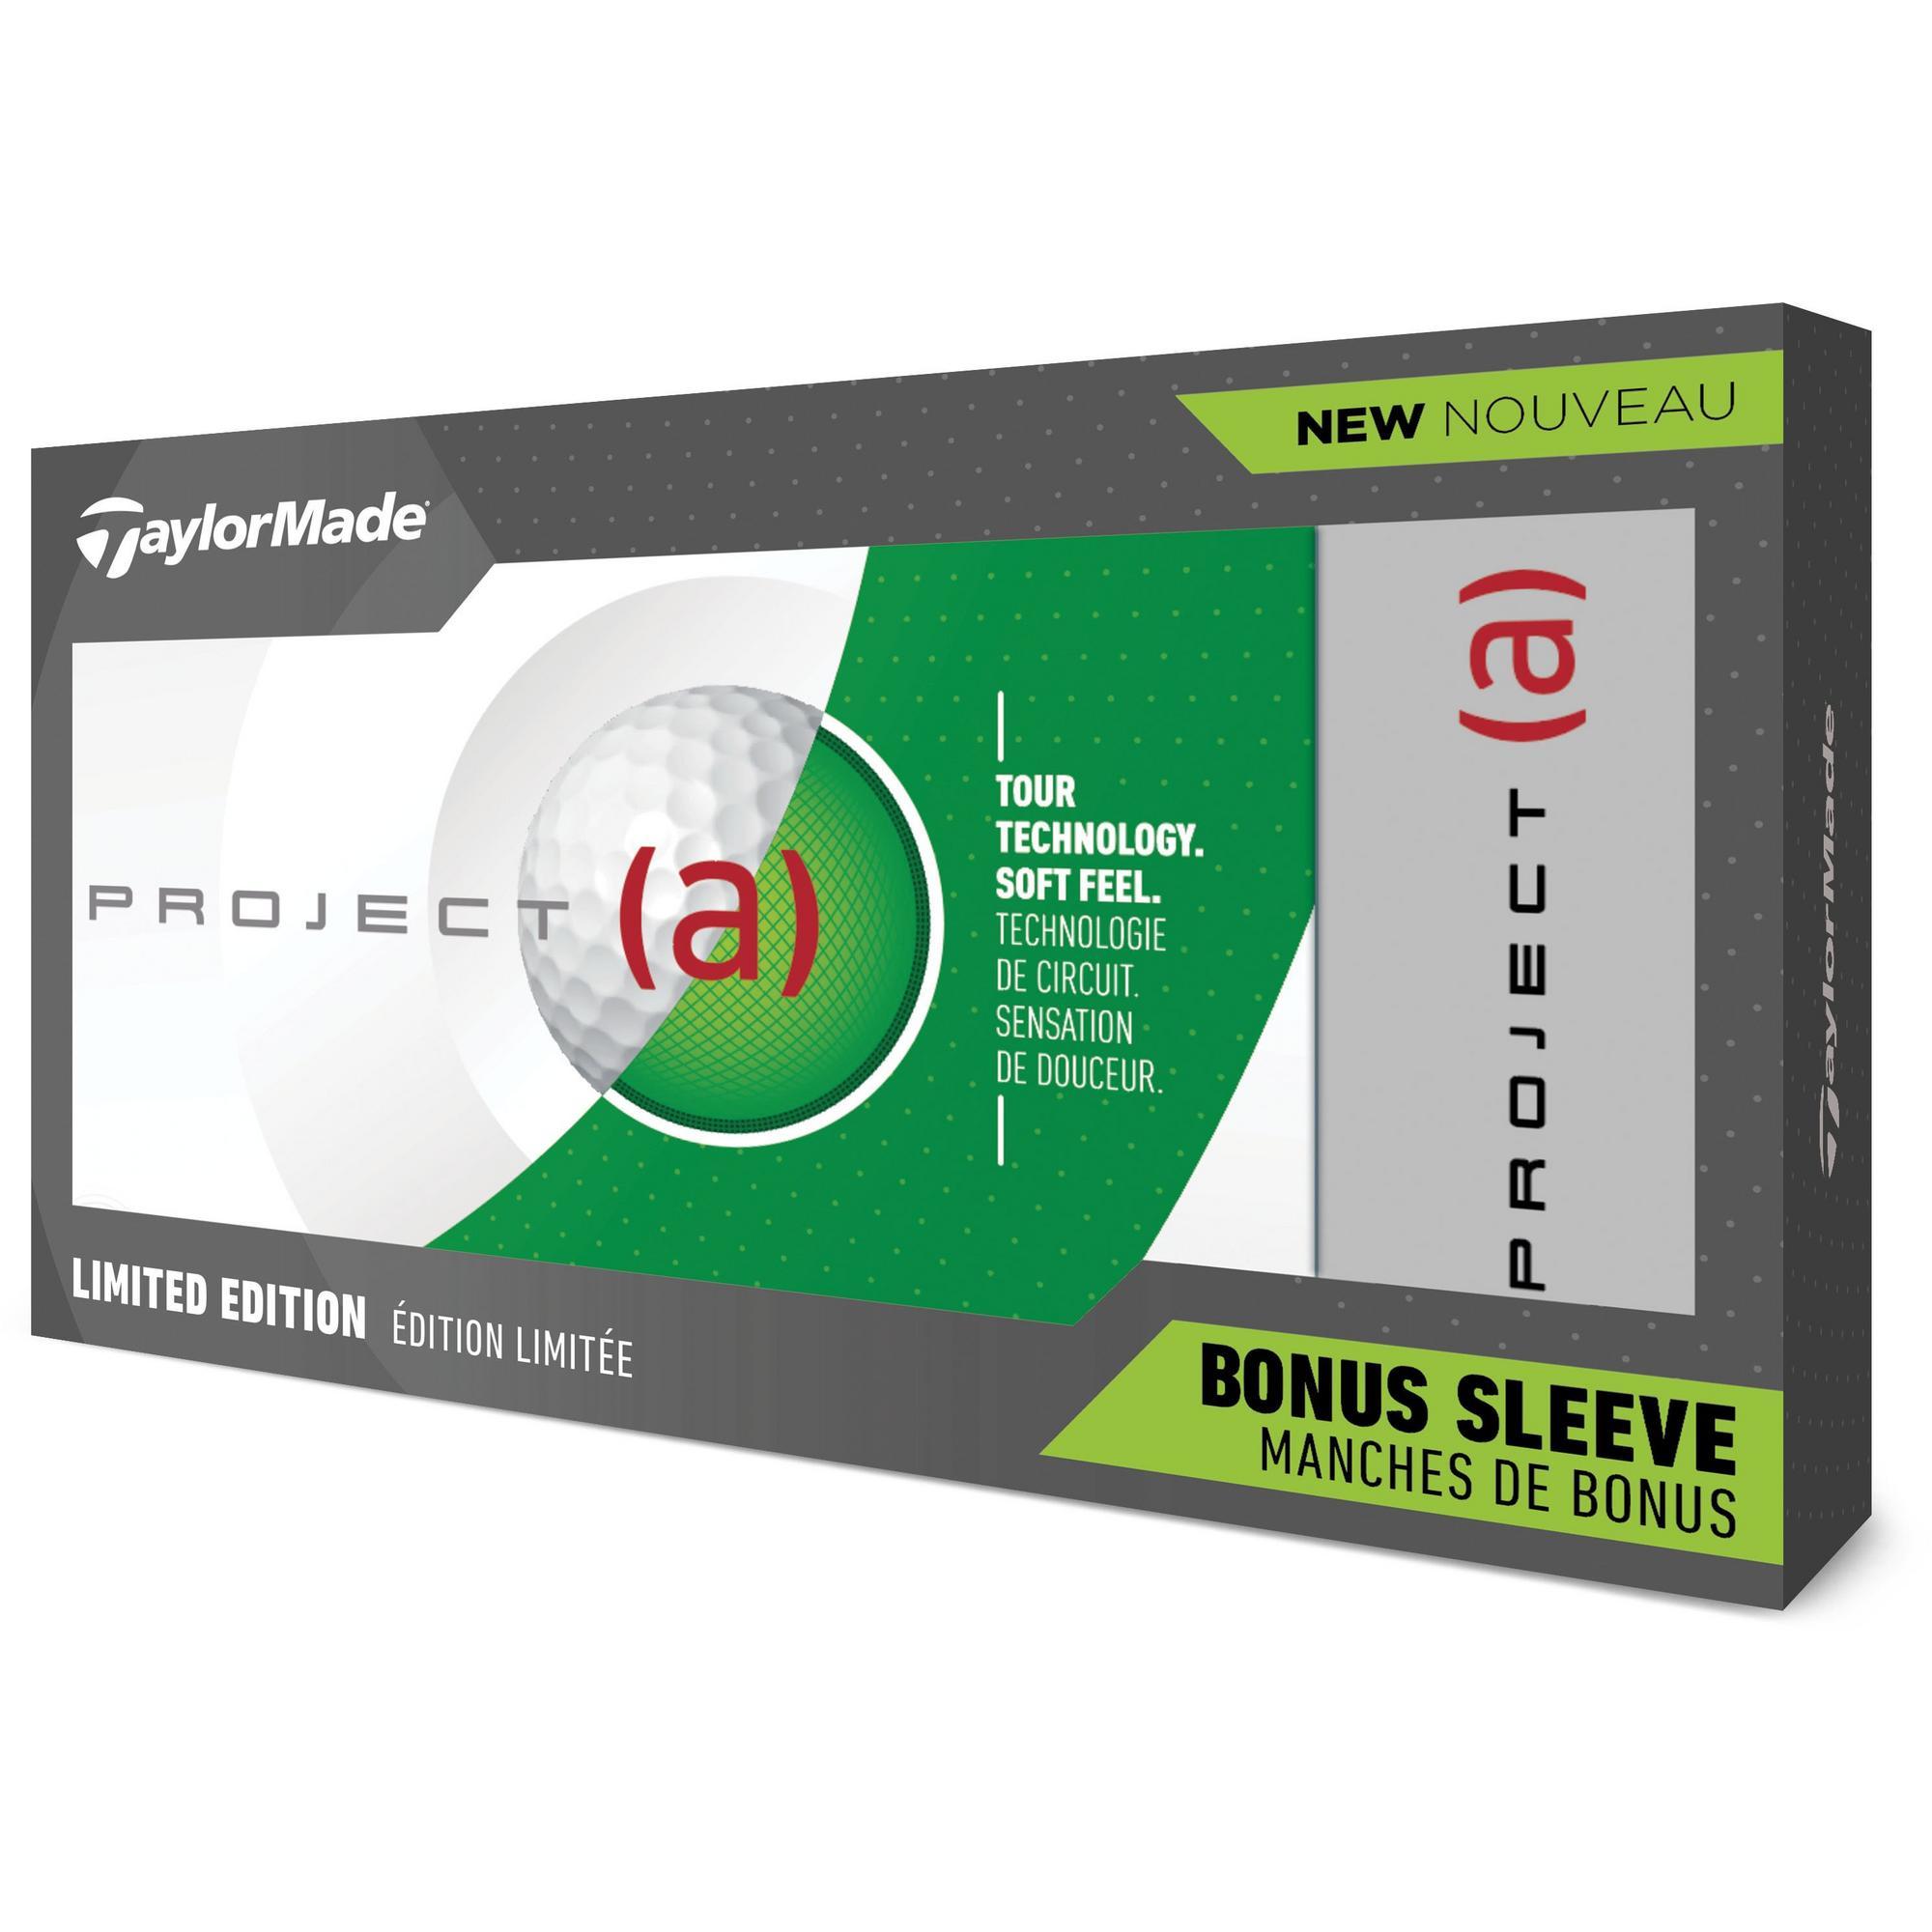 Project (a) Golf Balls - 15 Pack